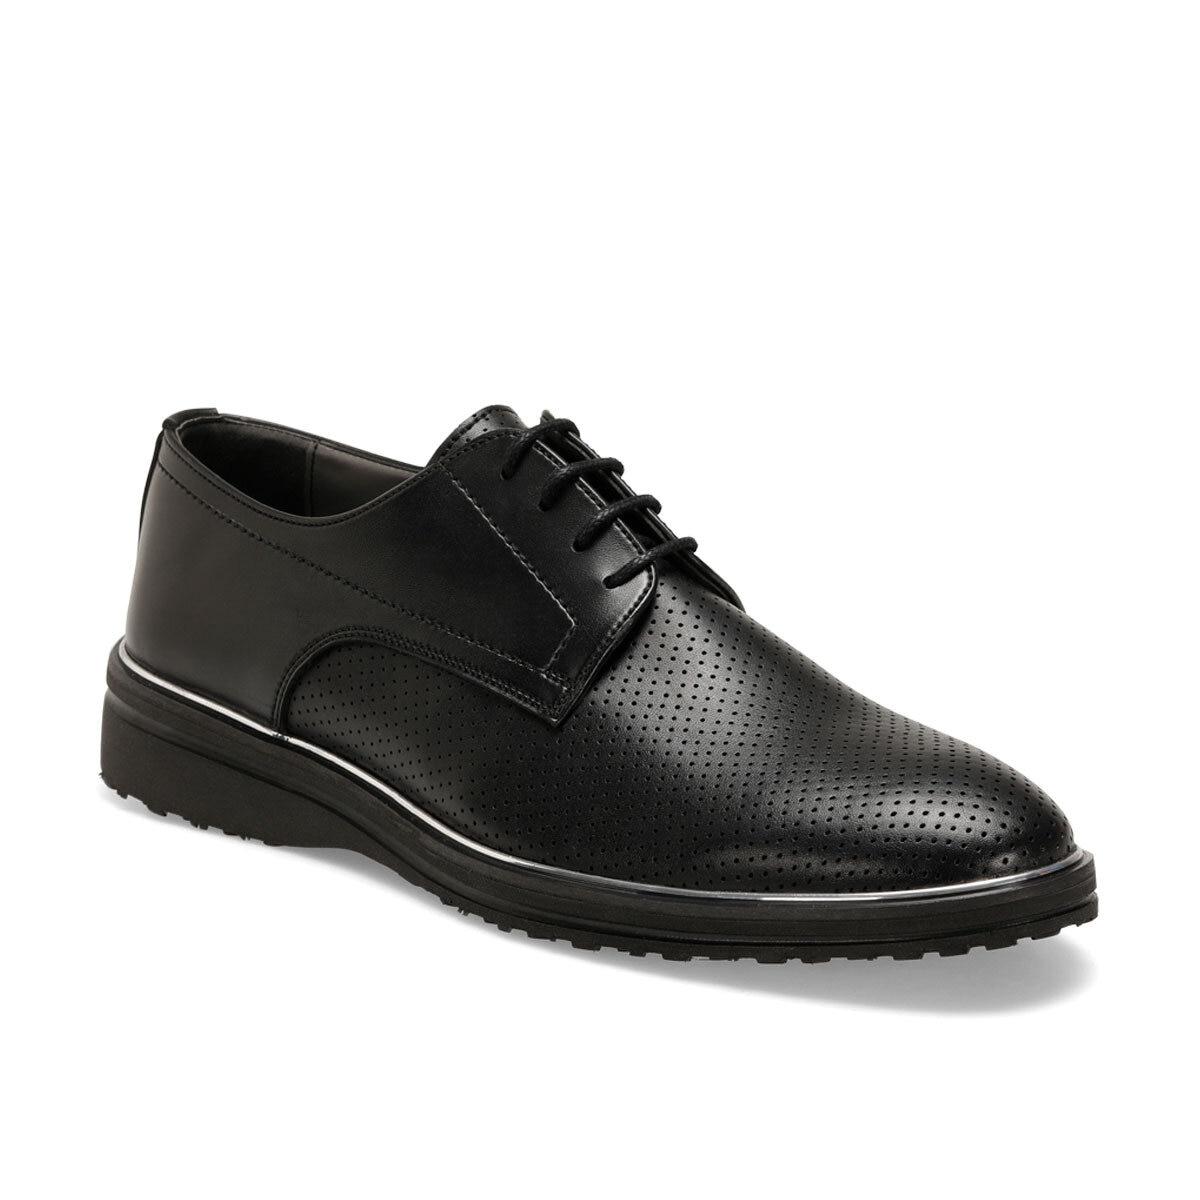 Flo 313-1 Zwarte Mannen Jurk Schoenen Jj-Stiller